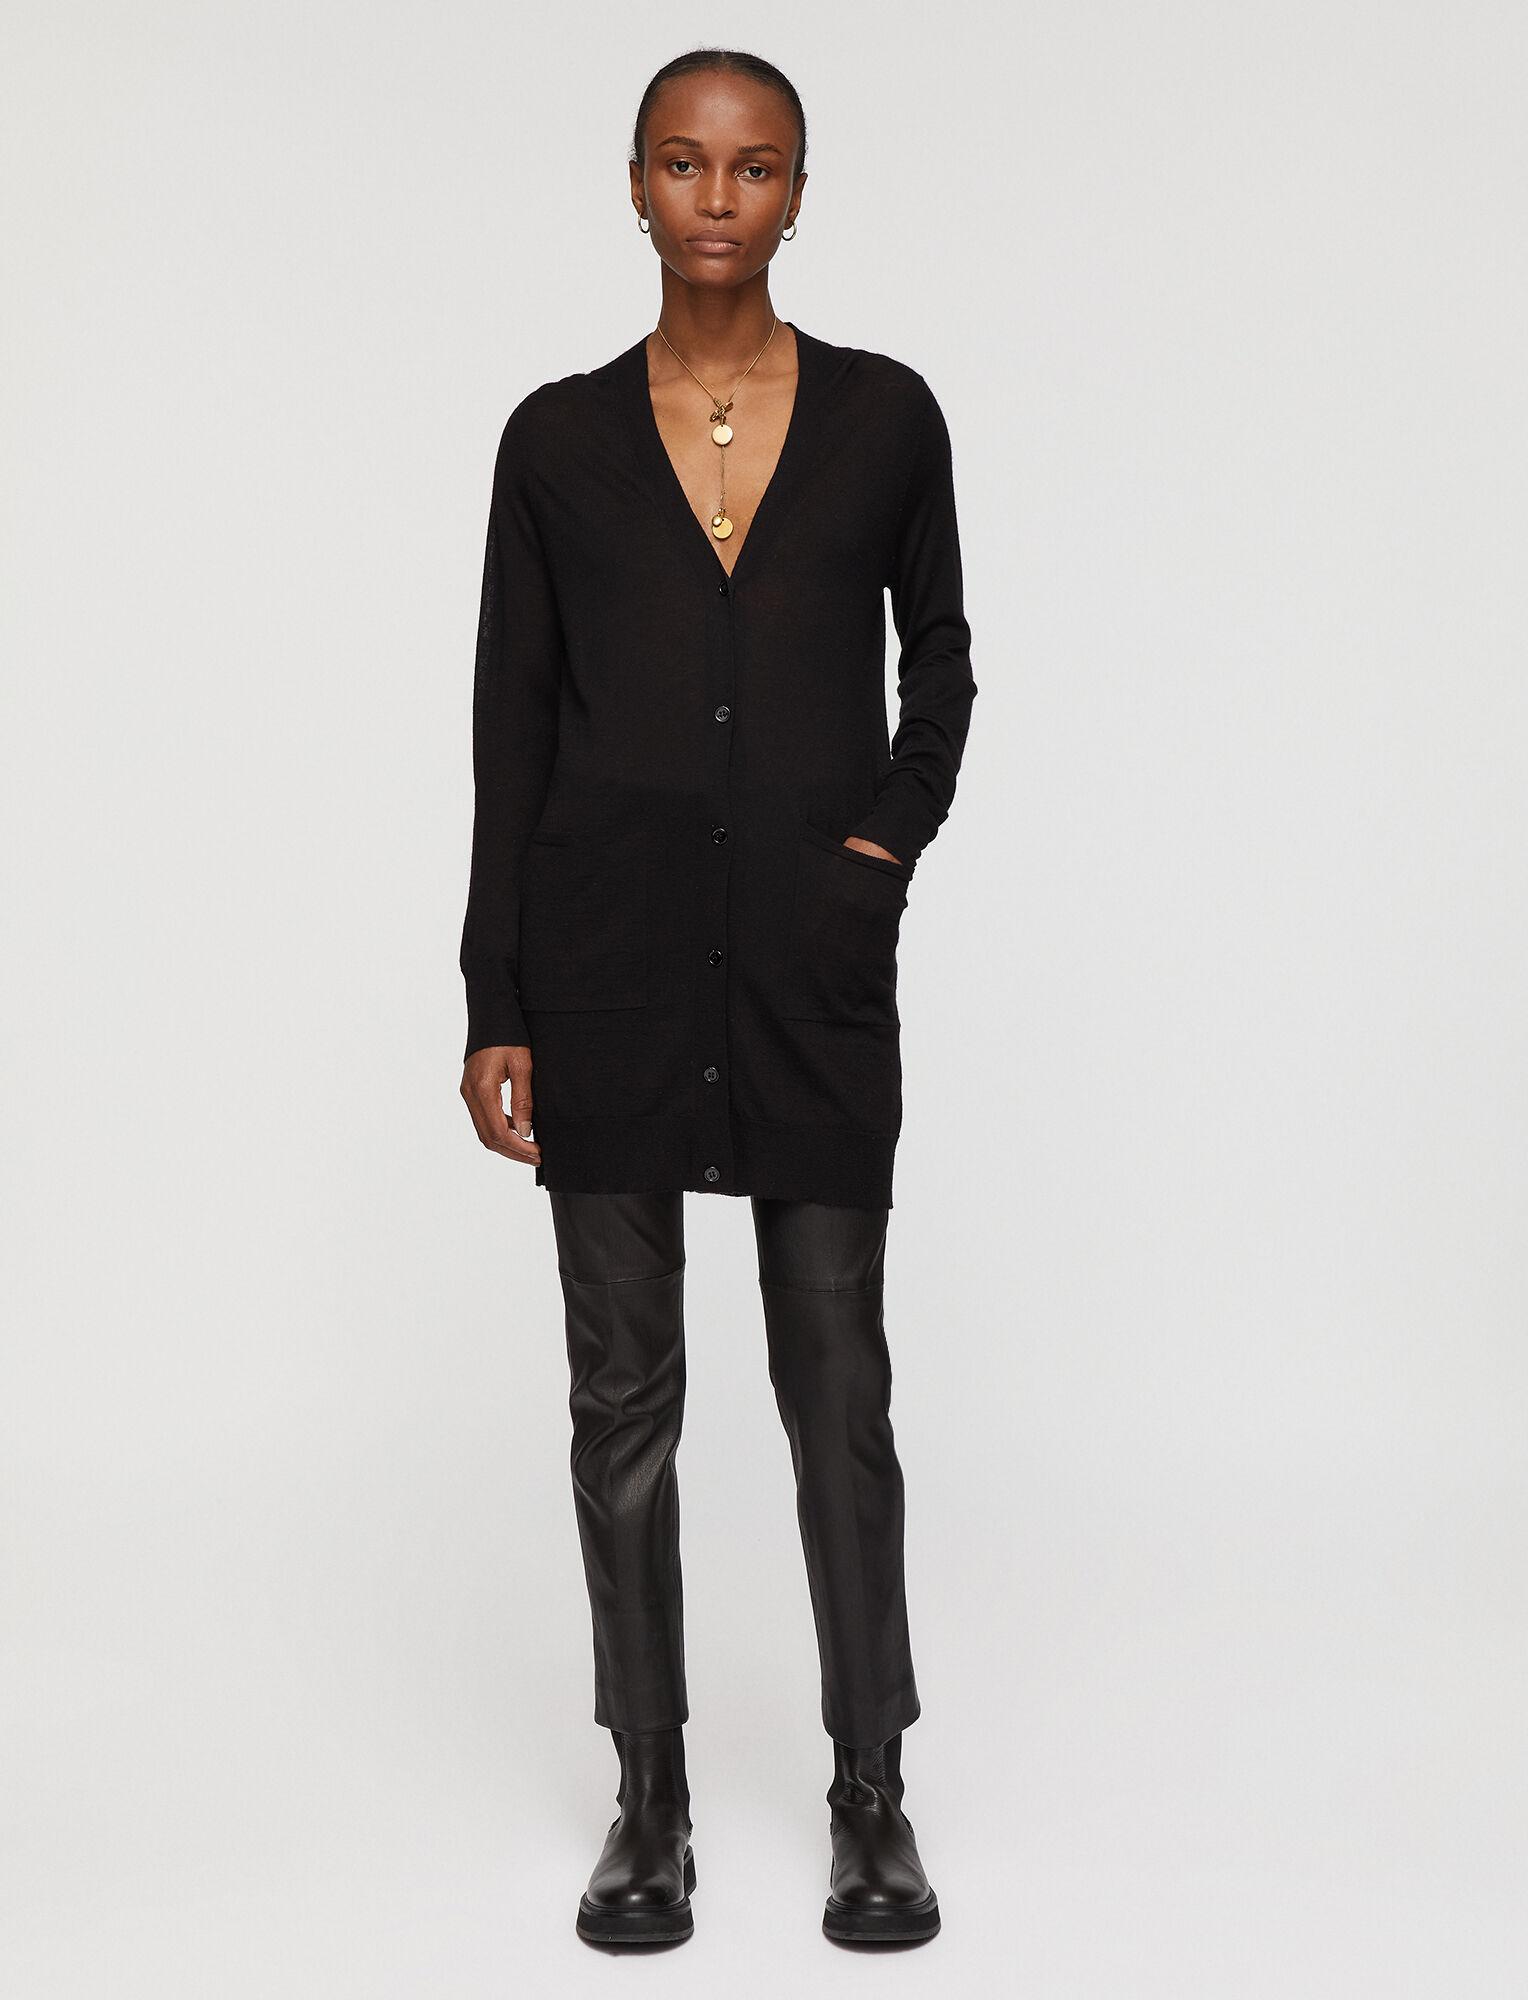 Joseph, Cardigan Cashair Knit, in BLACK